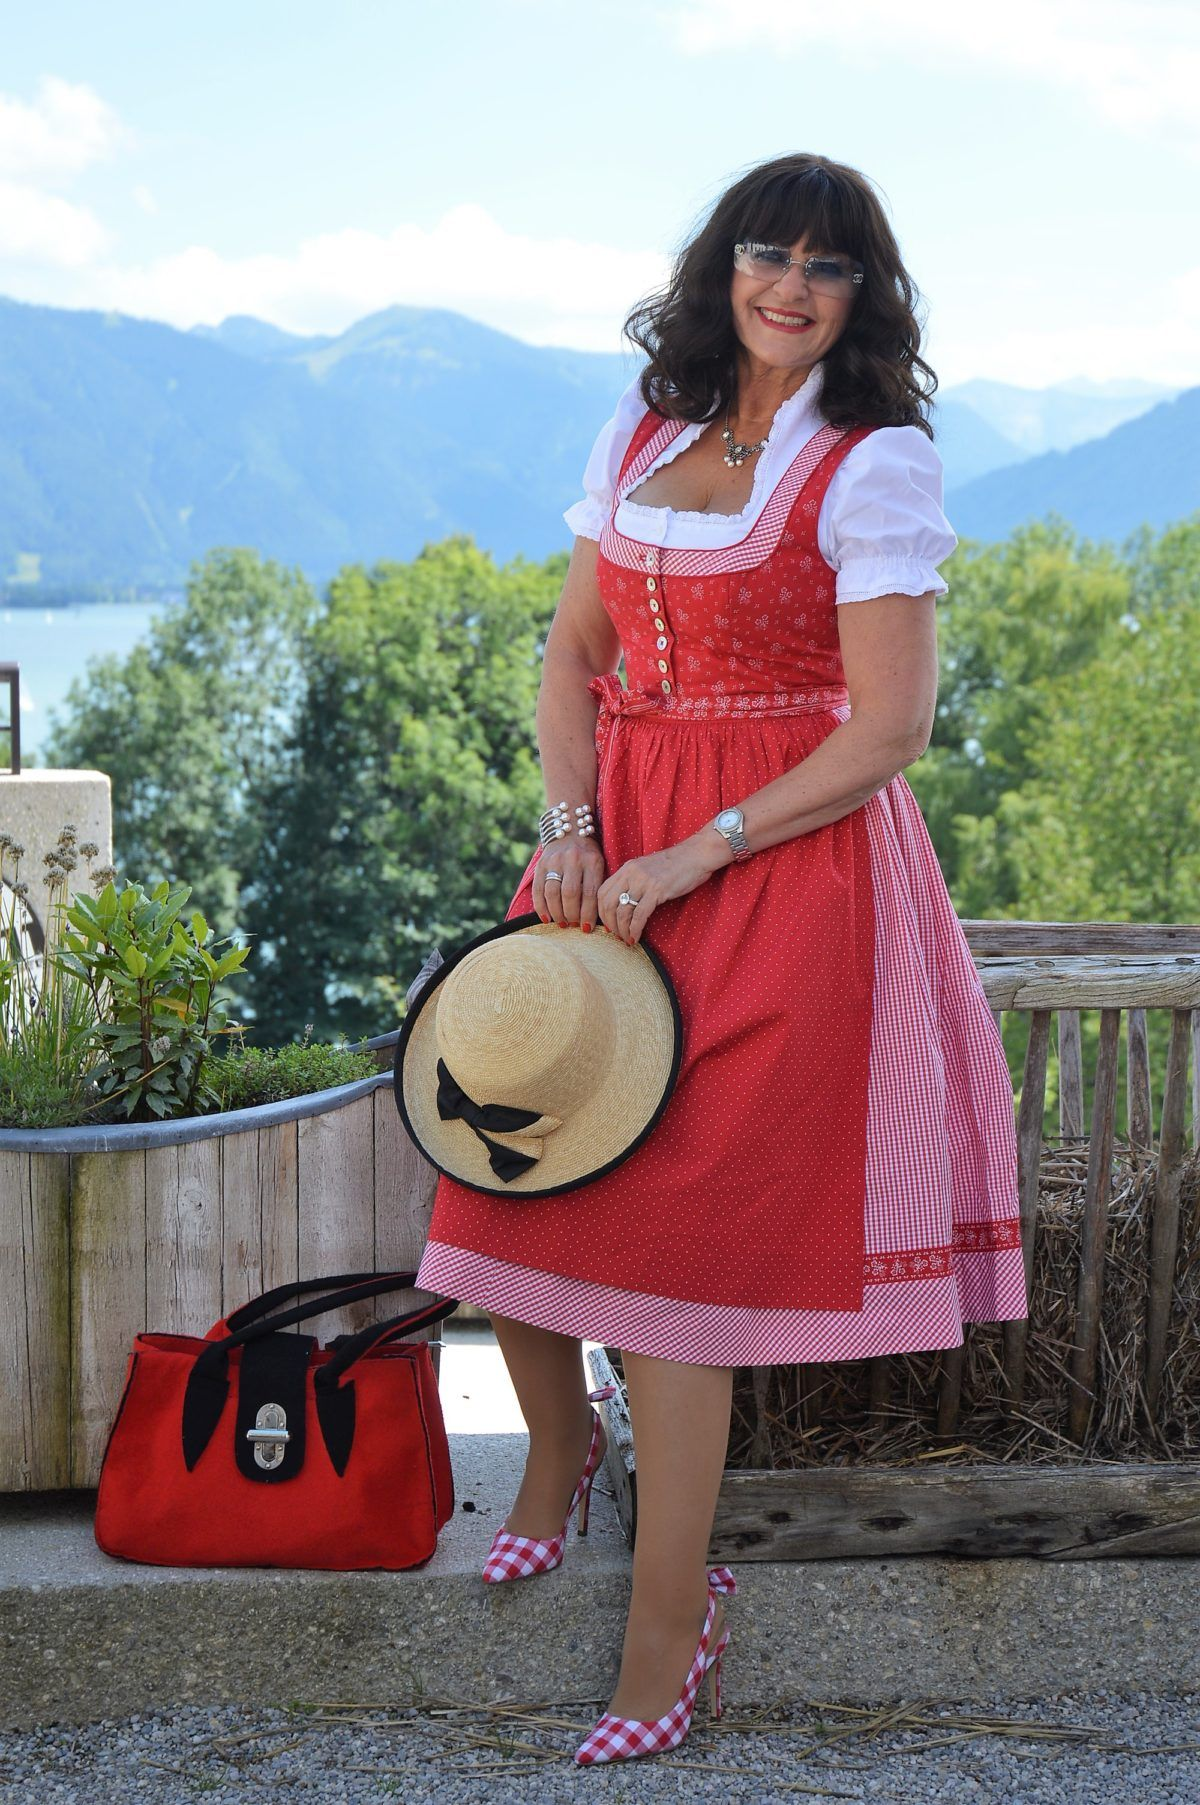 878c50011e9b16 Im roten Dirndl zum Seefest in Tegernsee - Martina Berg - Lady 50plus